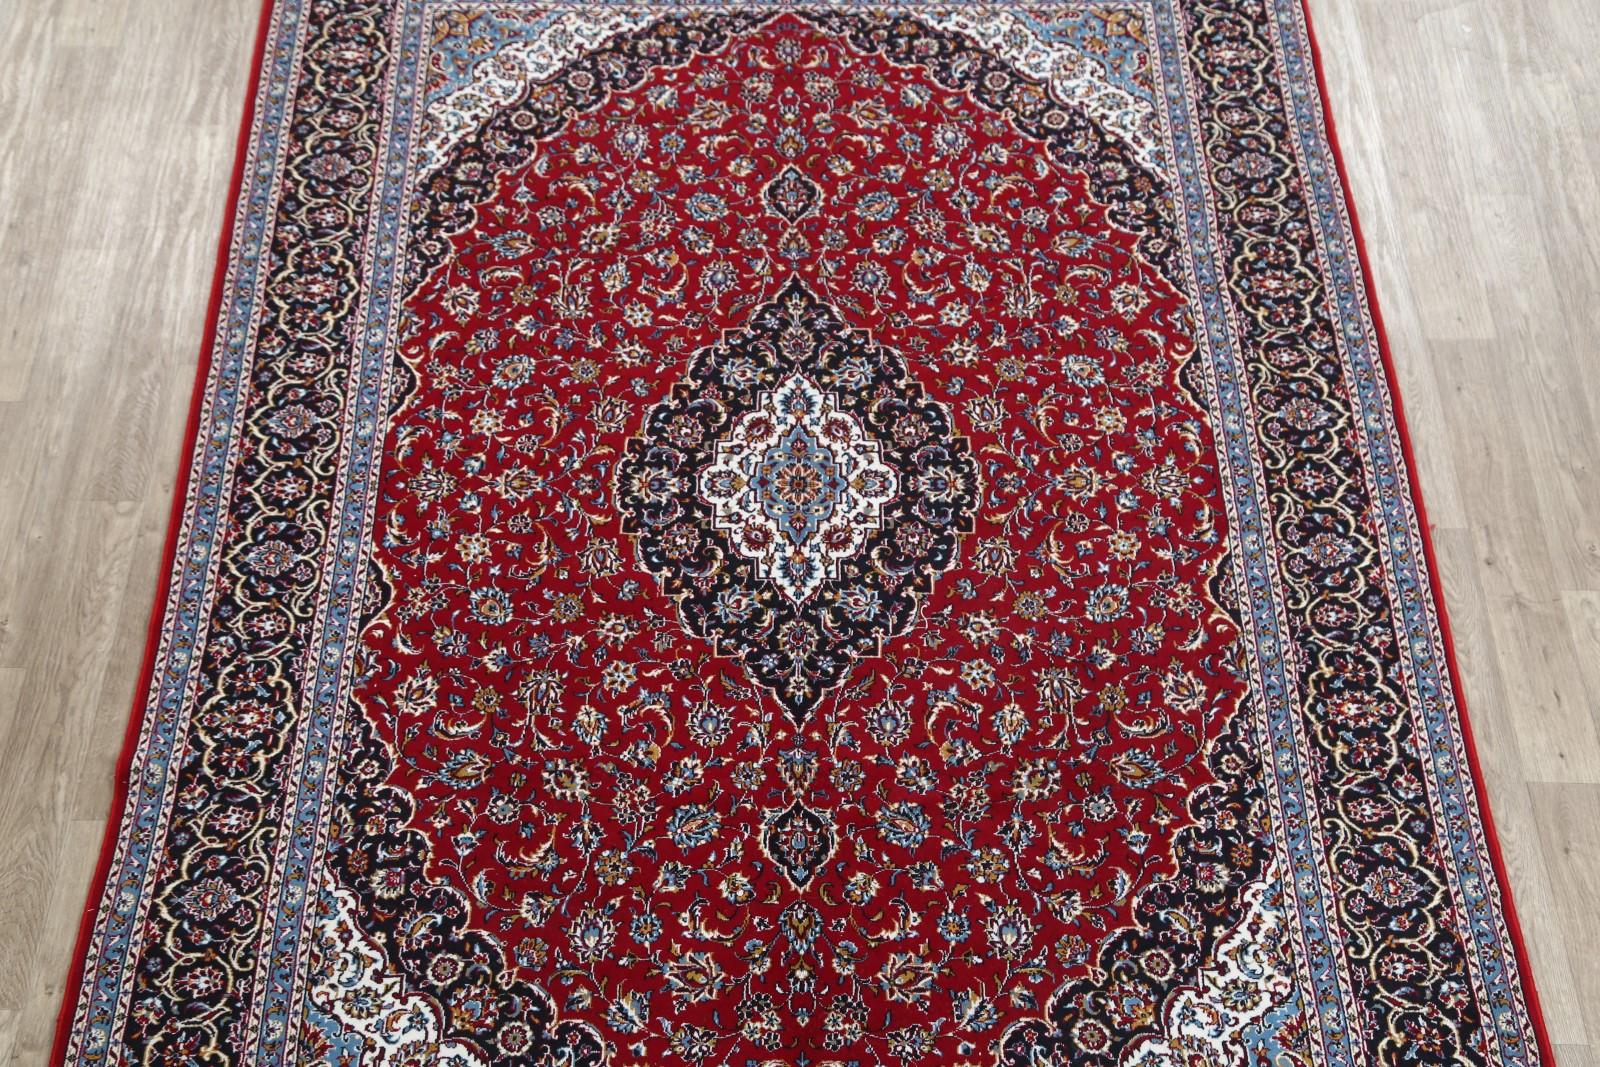 Soft Plush Floral 8x11 Kashan Persian Area Rug